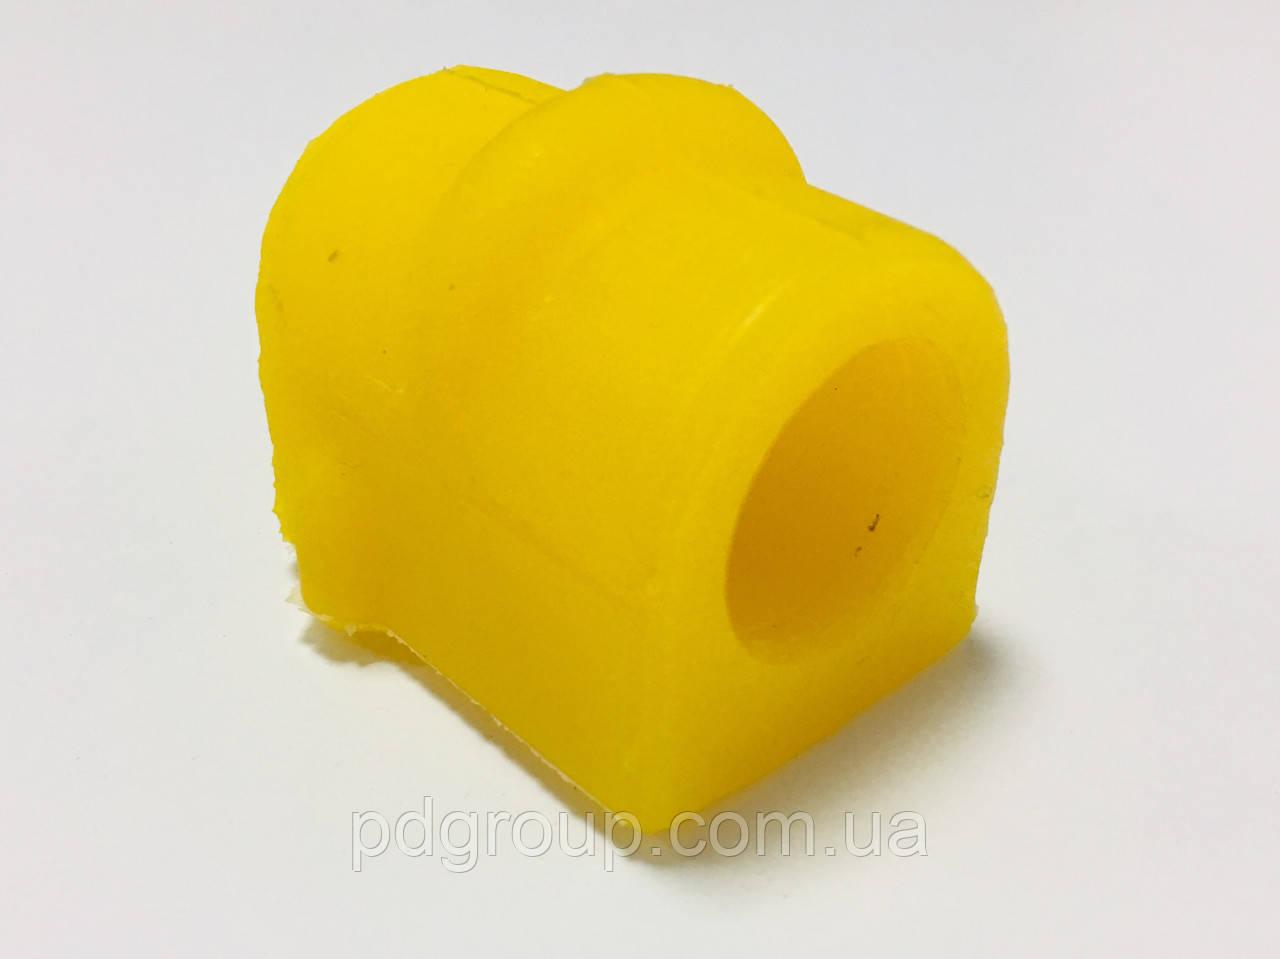 Втулка стабилизатора переднего OPEL (OE 03 50 130)